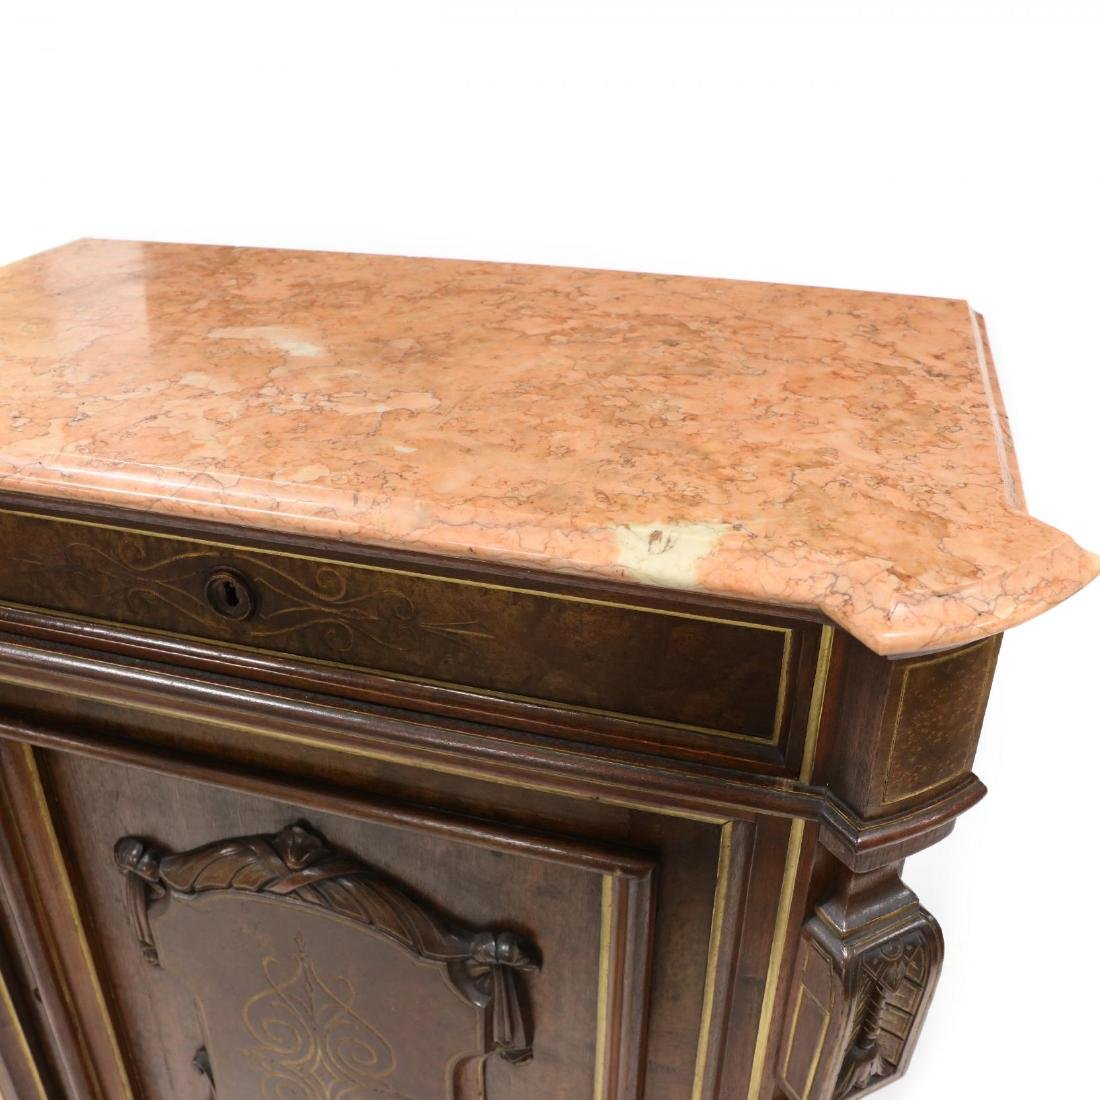 American Renaissance Revival Marble Top Cabinet - 2